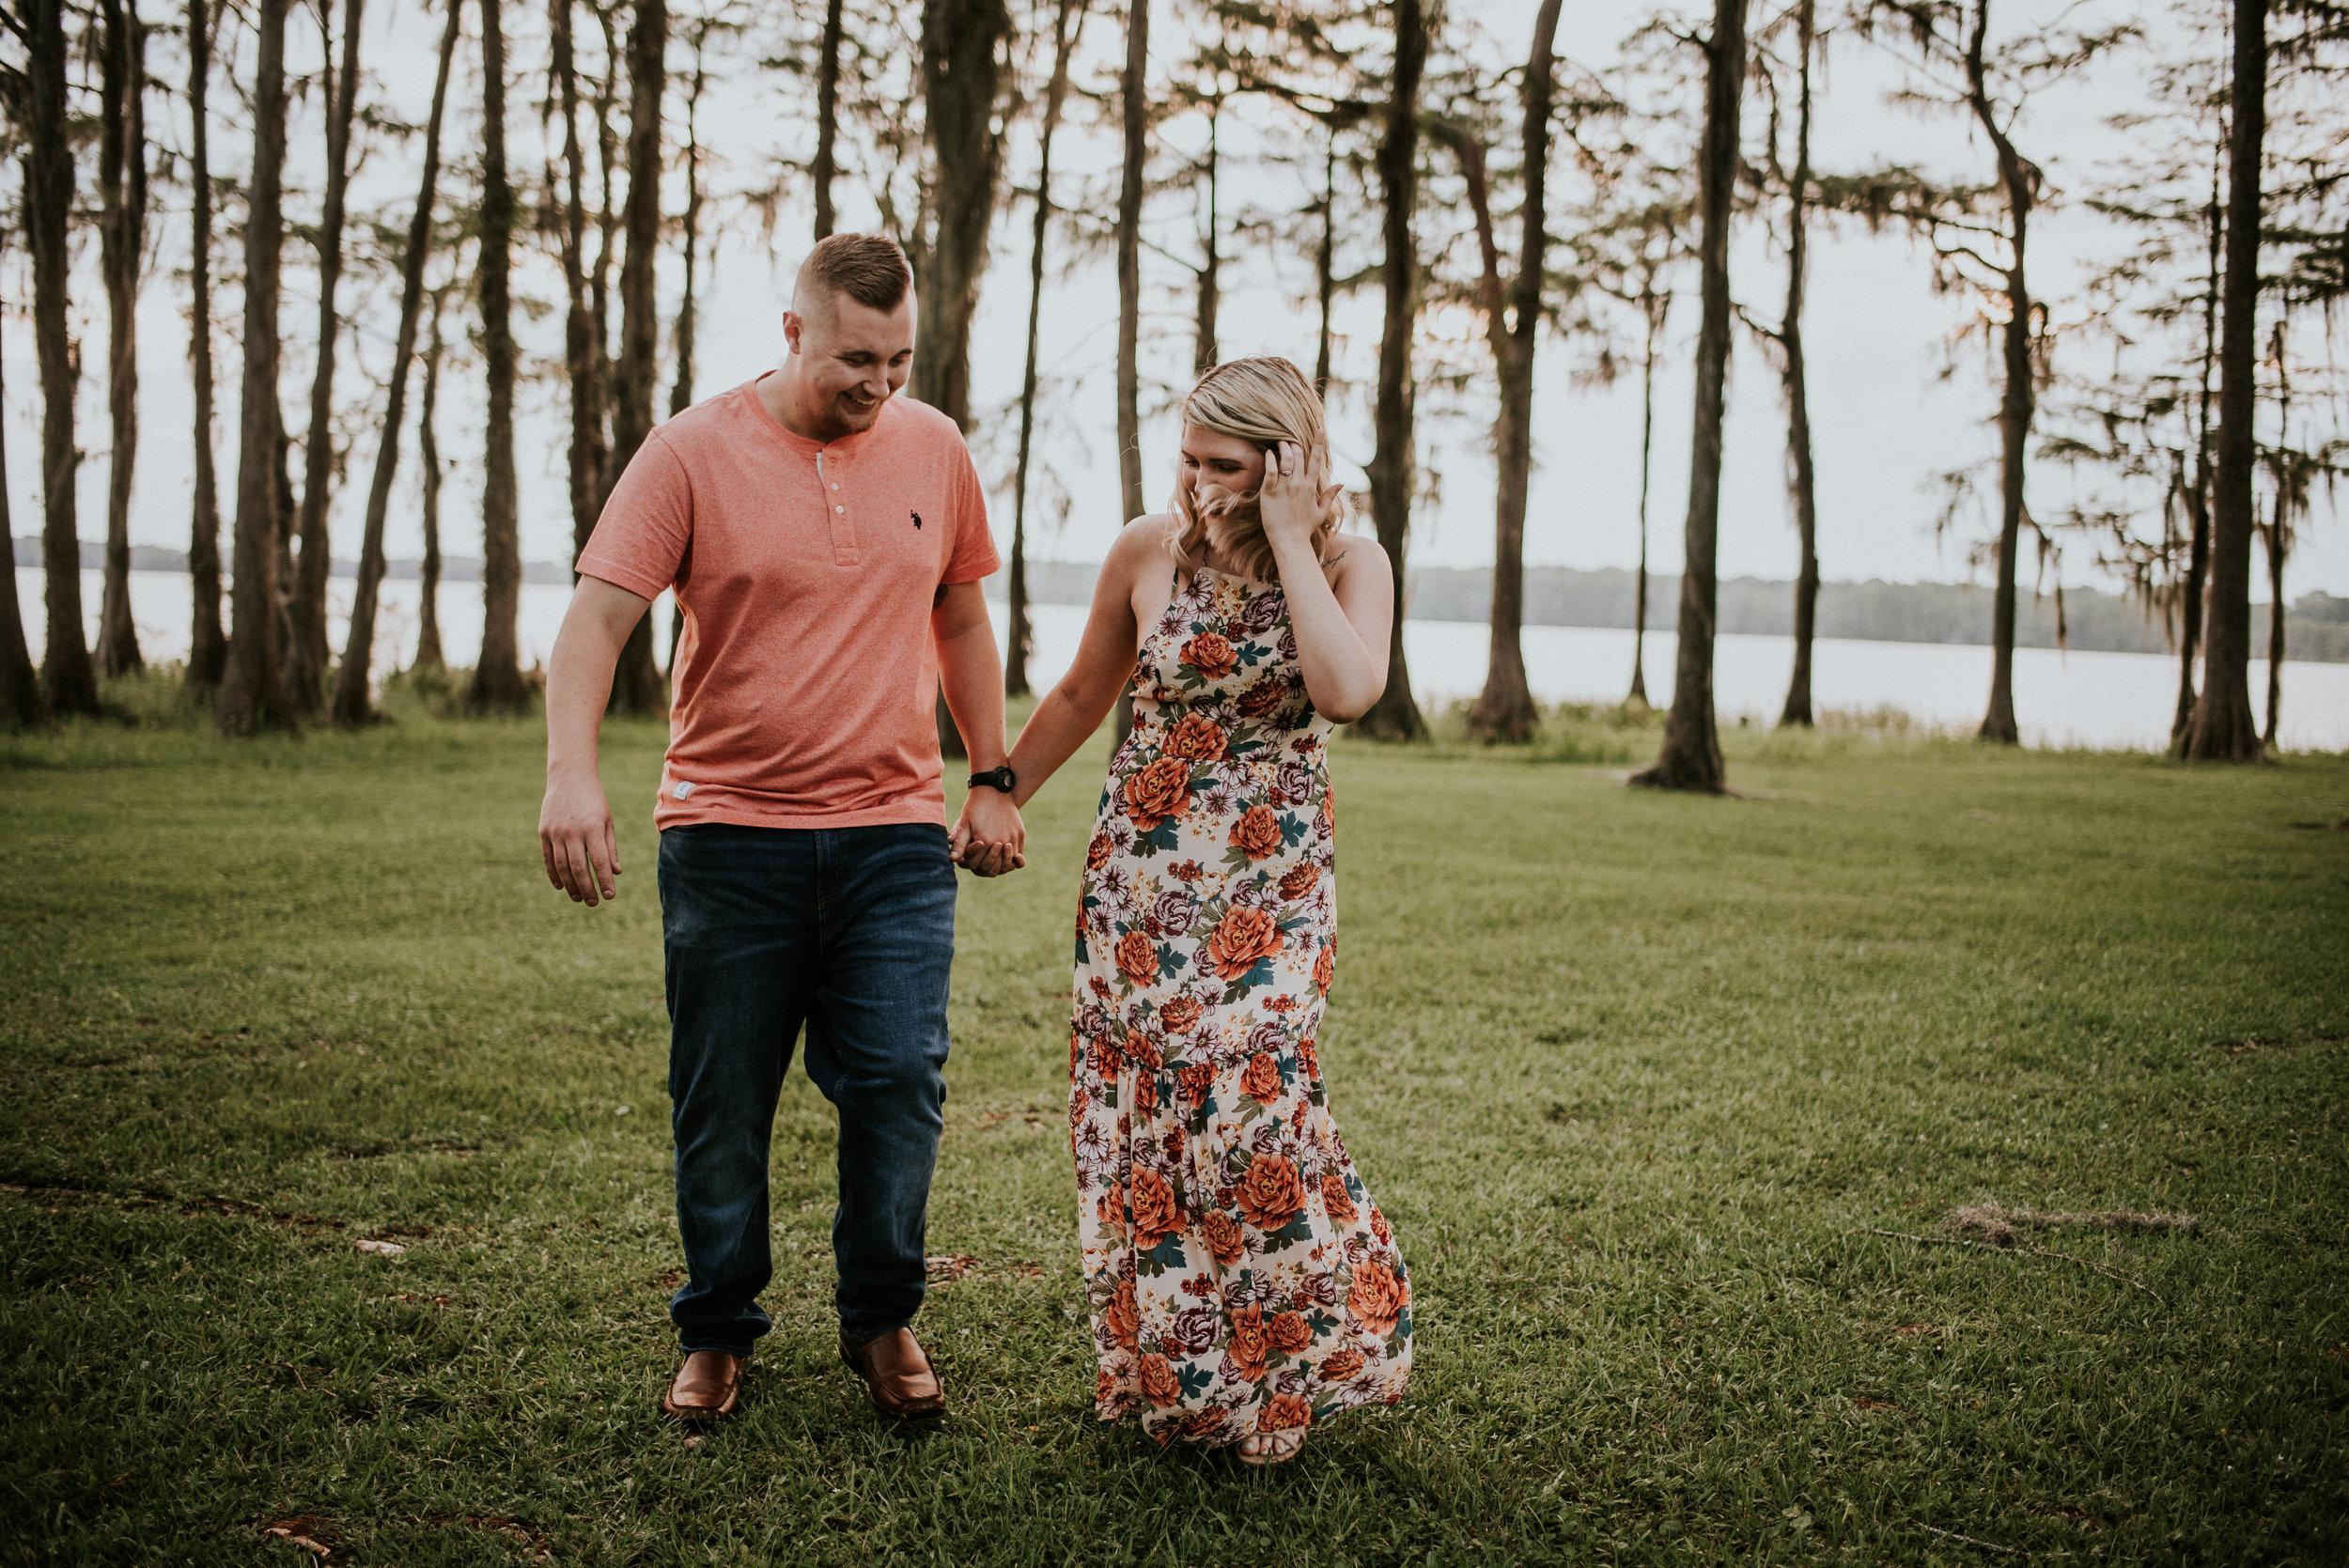 kimberly-trey-crestview-florida-couples-photographer-9.jpg